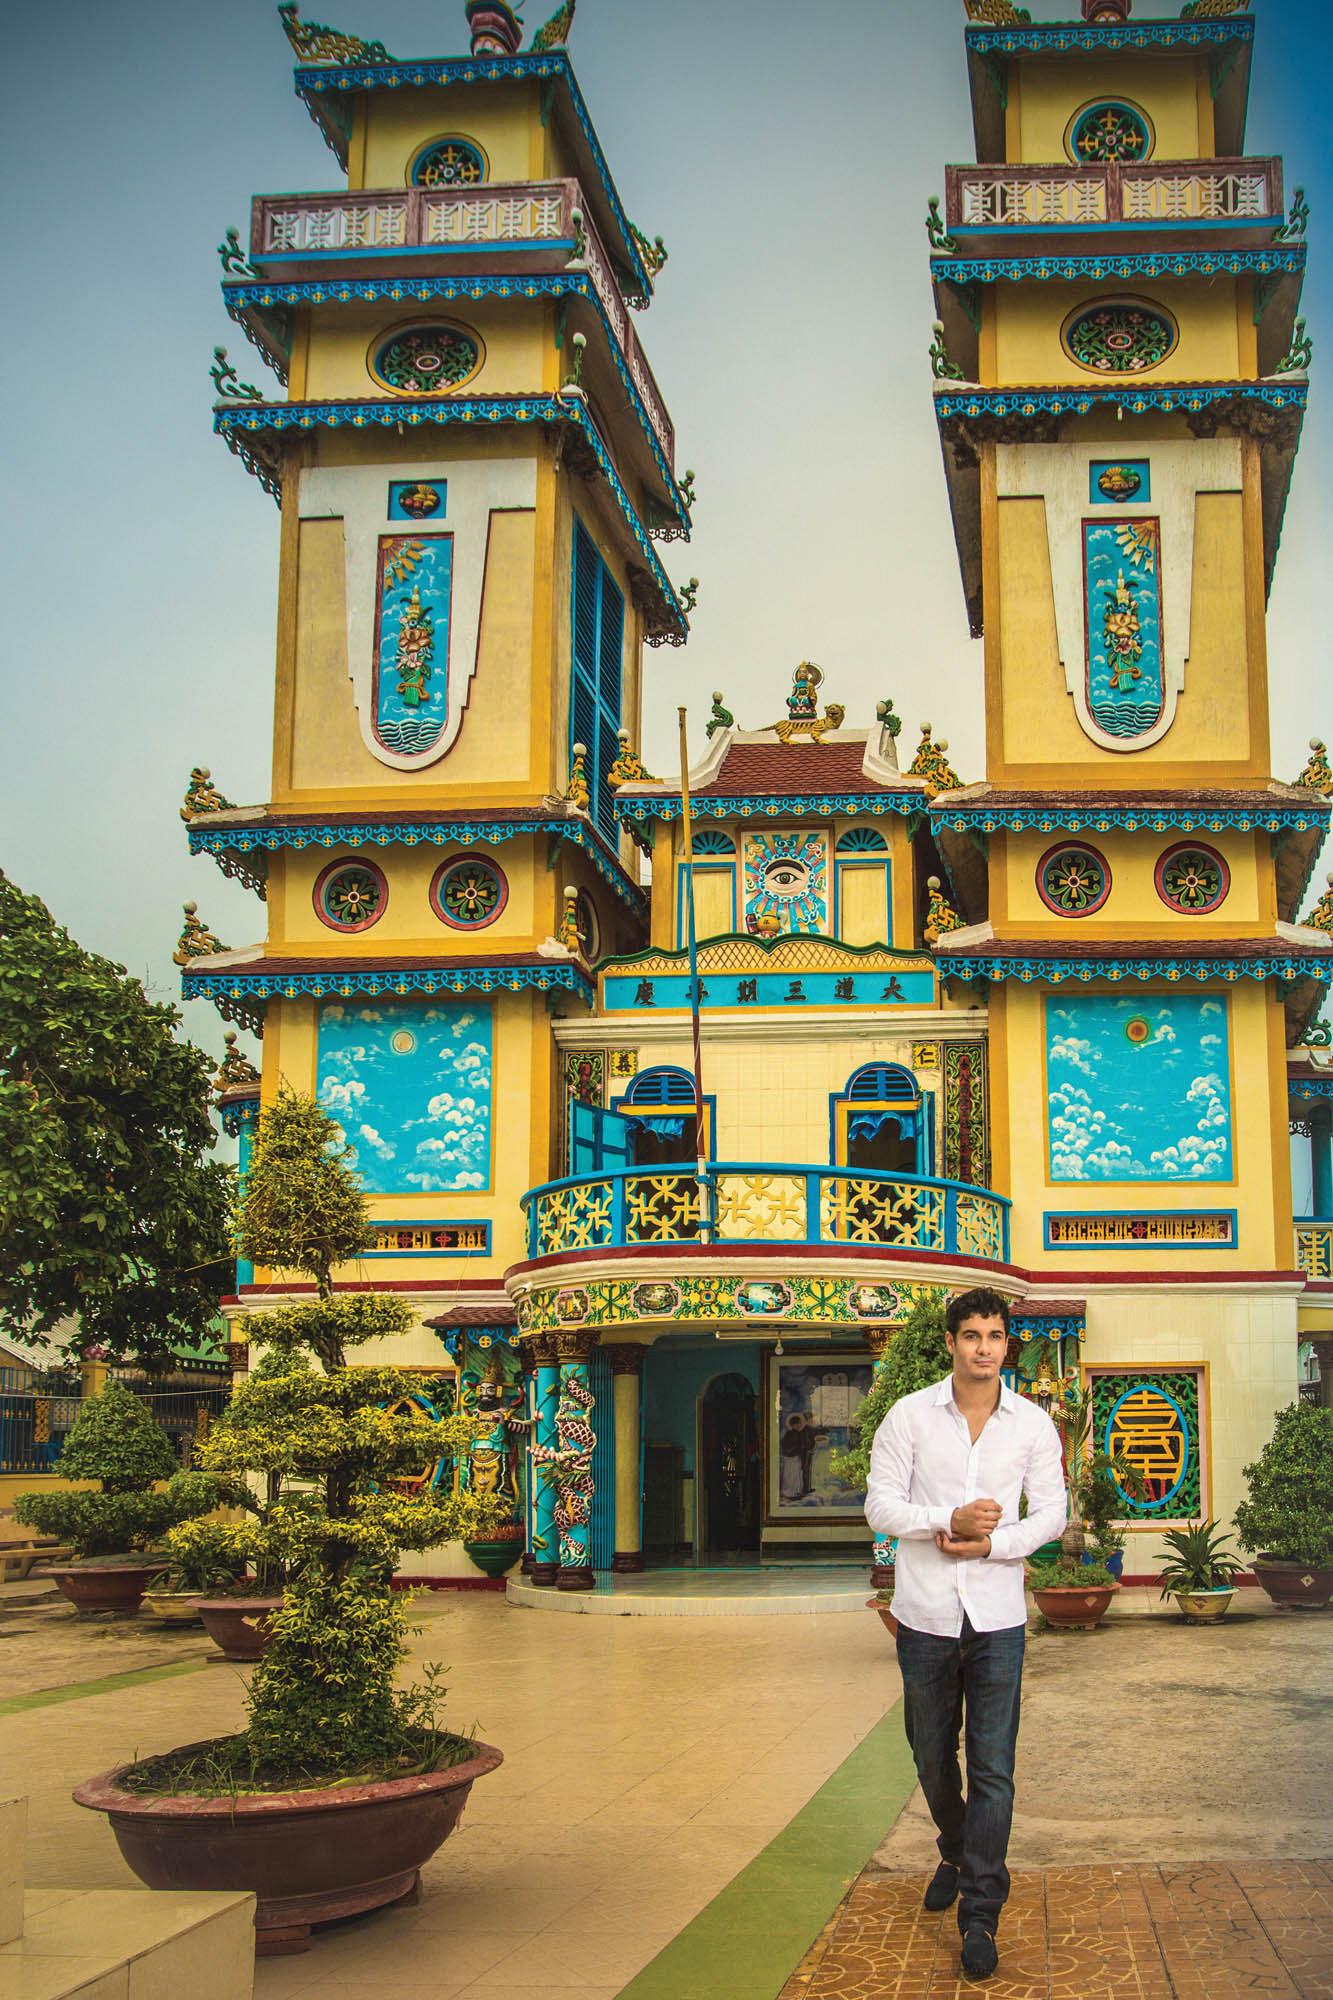 Outside the vibrant Long Son temple in Chau Doc, Vietnam